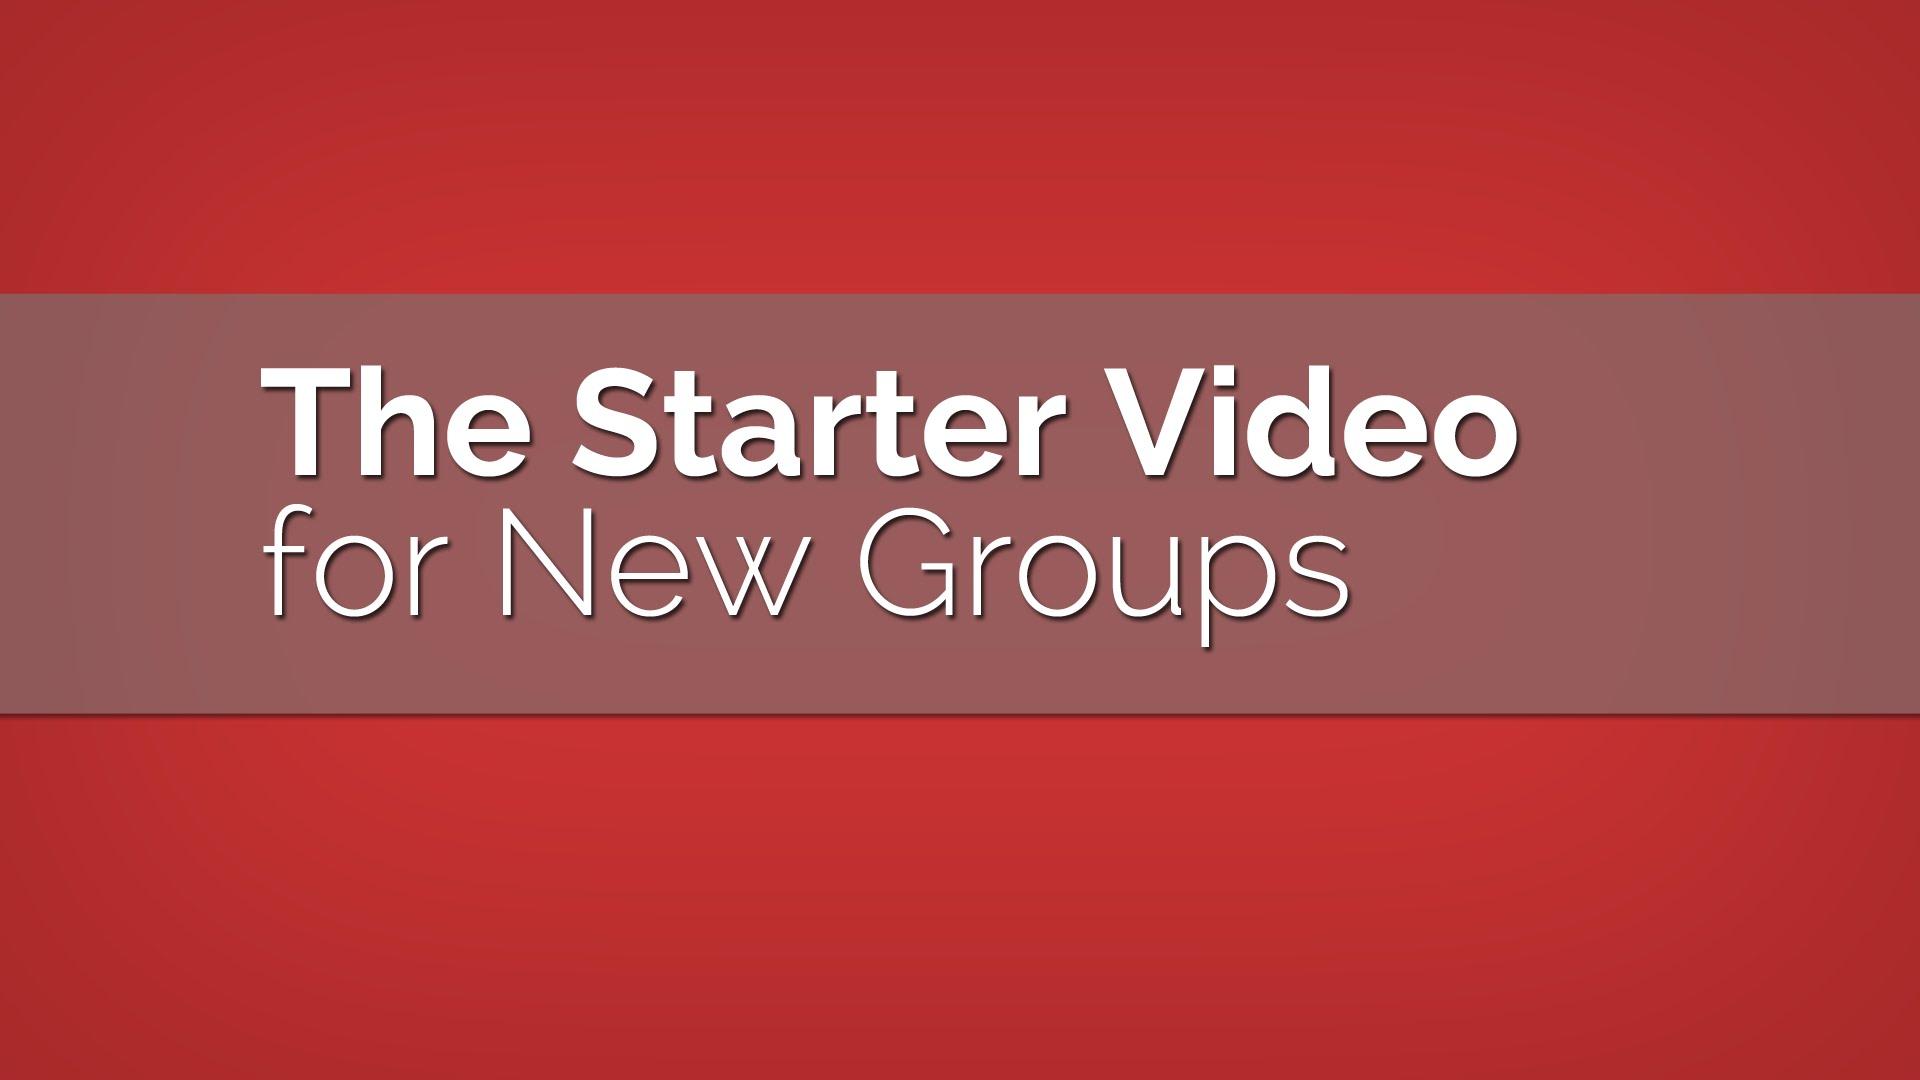 The Starter Video: Tips for New Groups